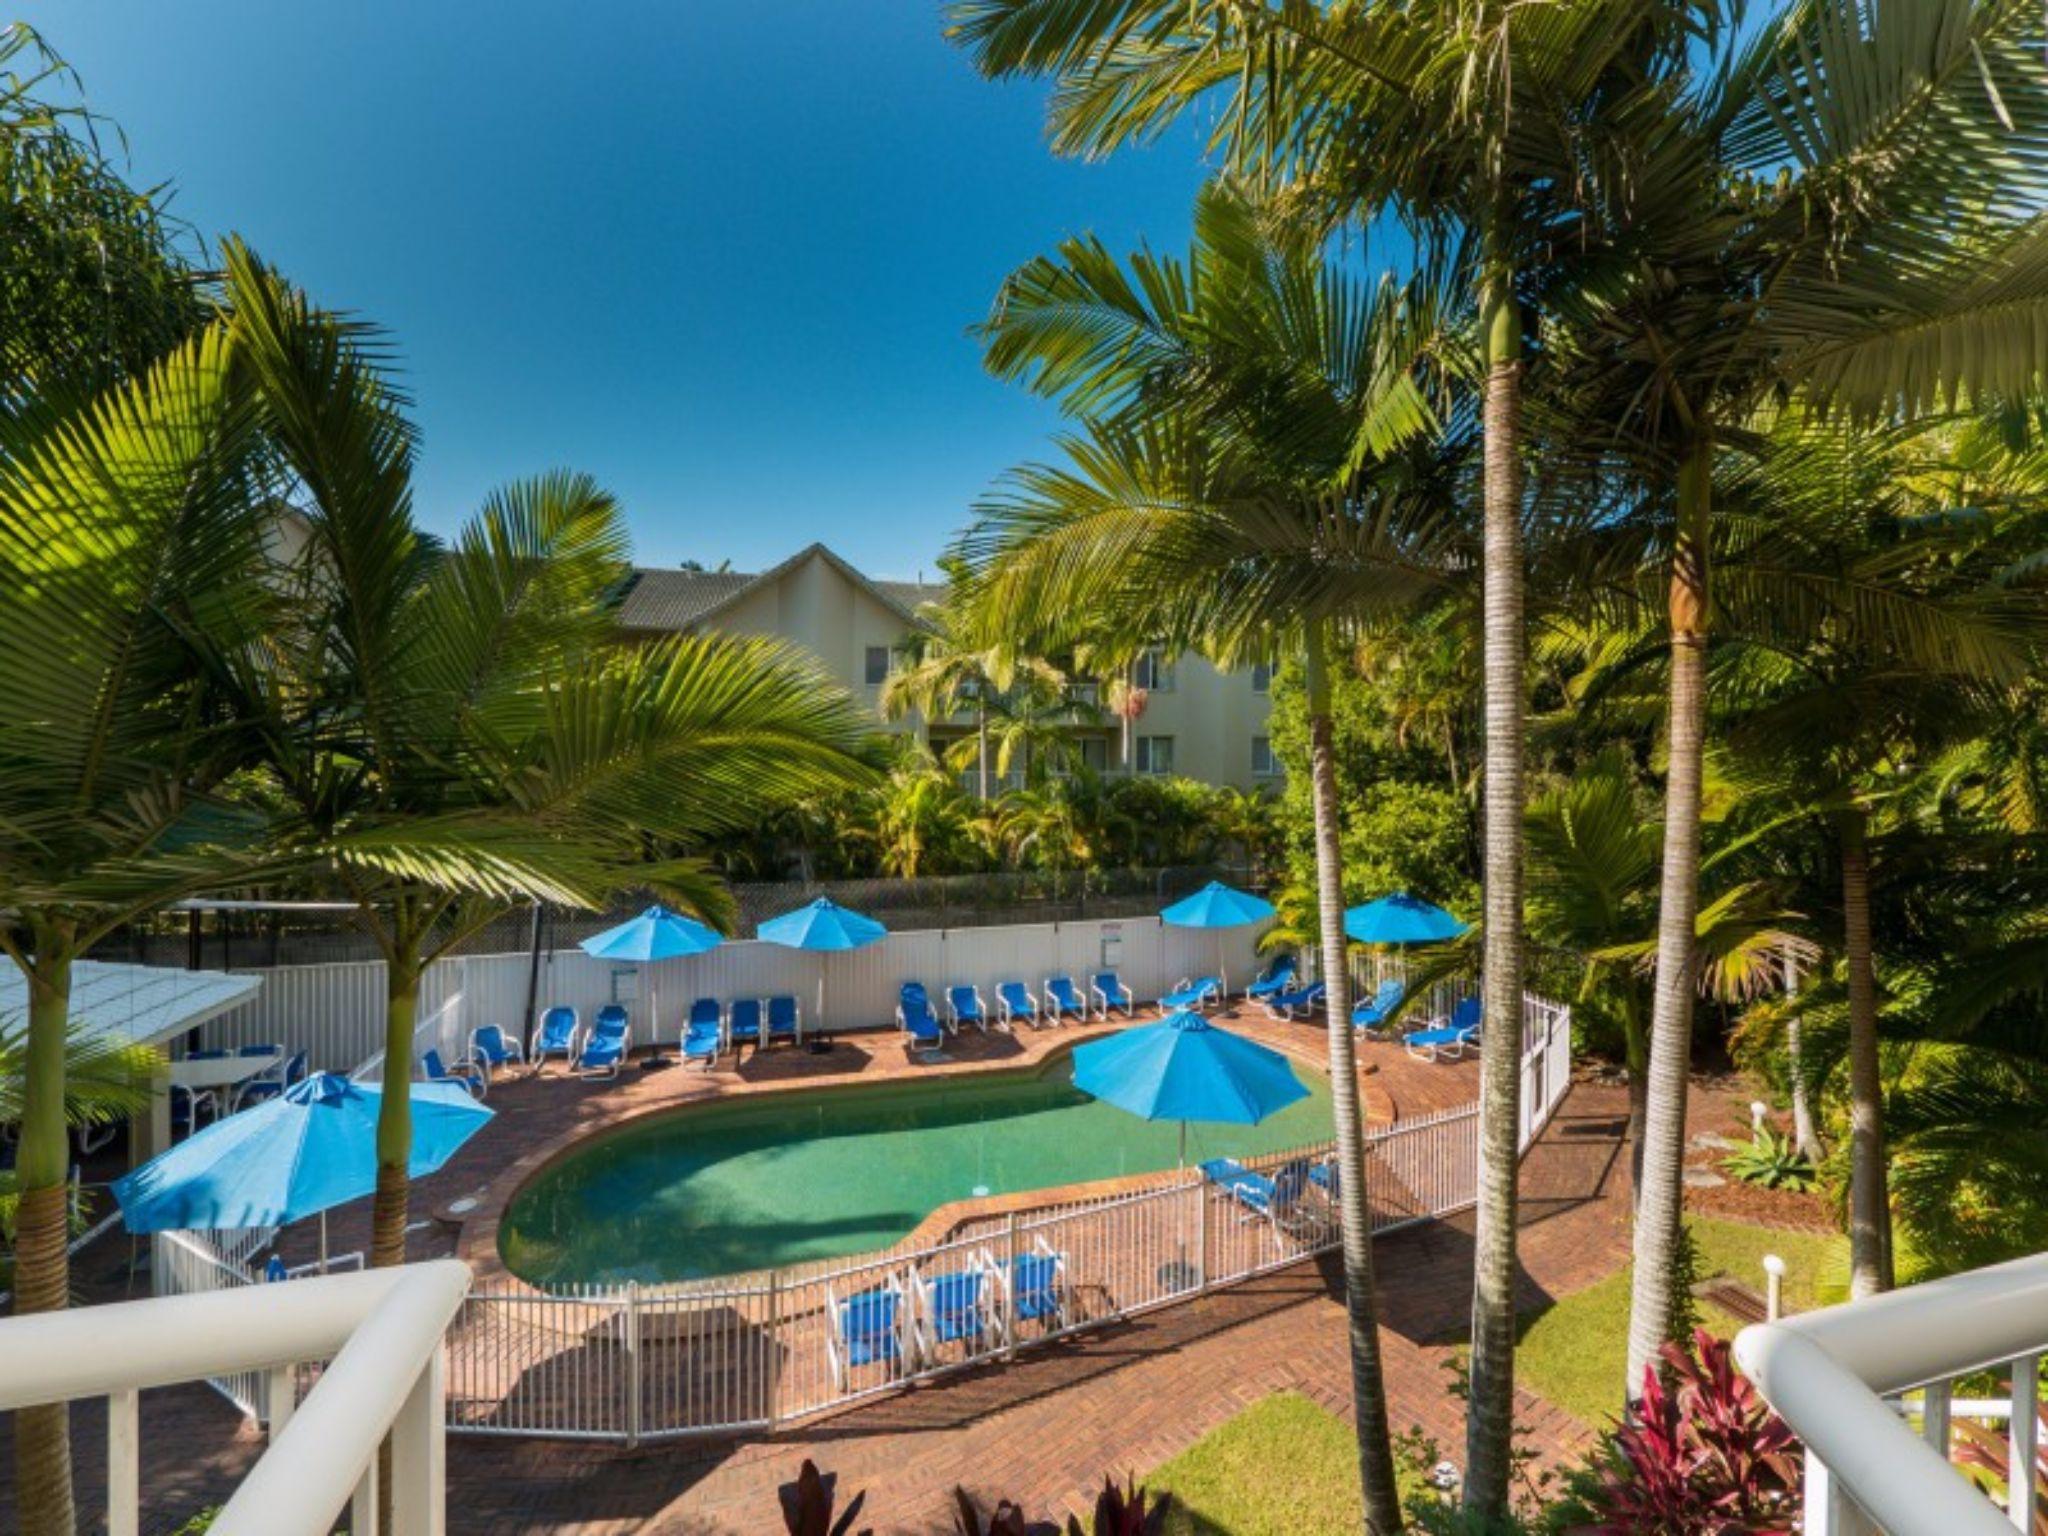 Surfers Tropique Holiday Apartments